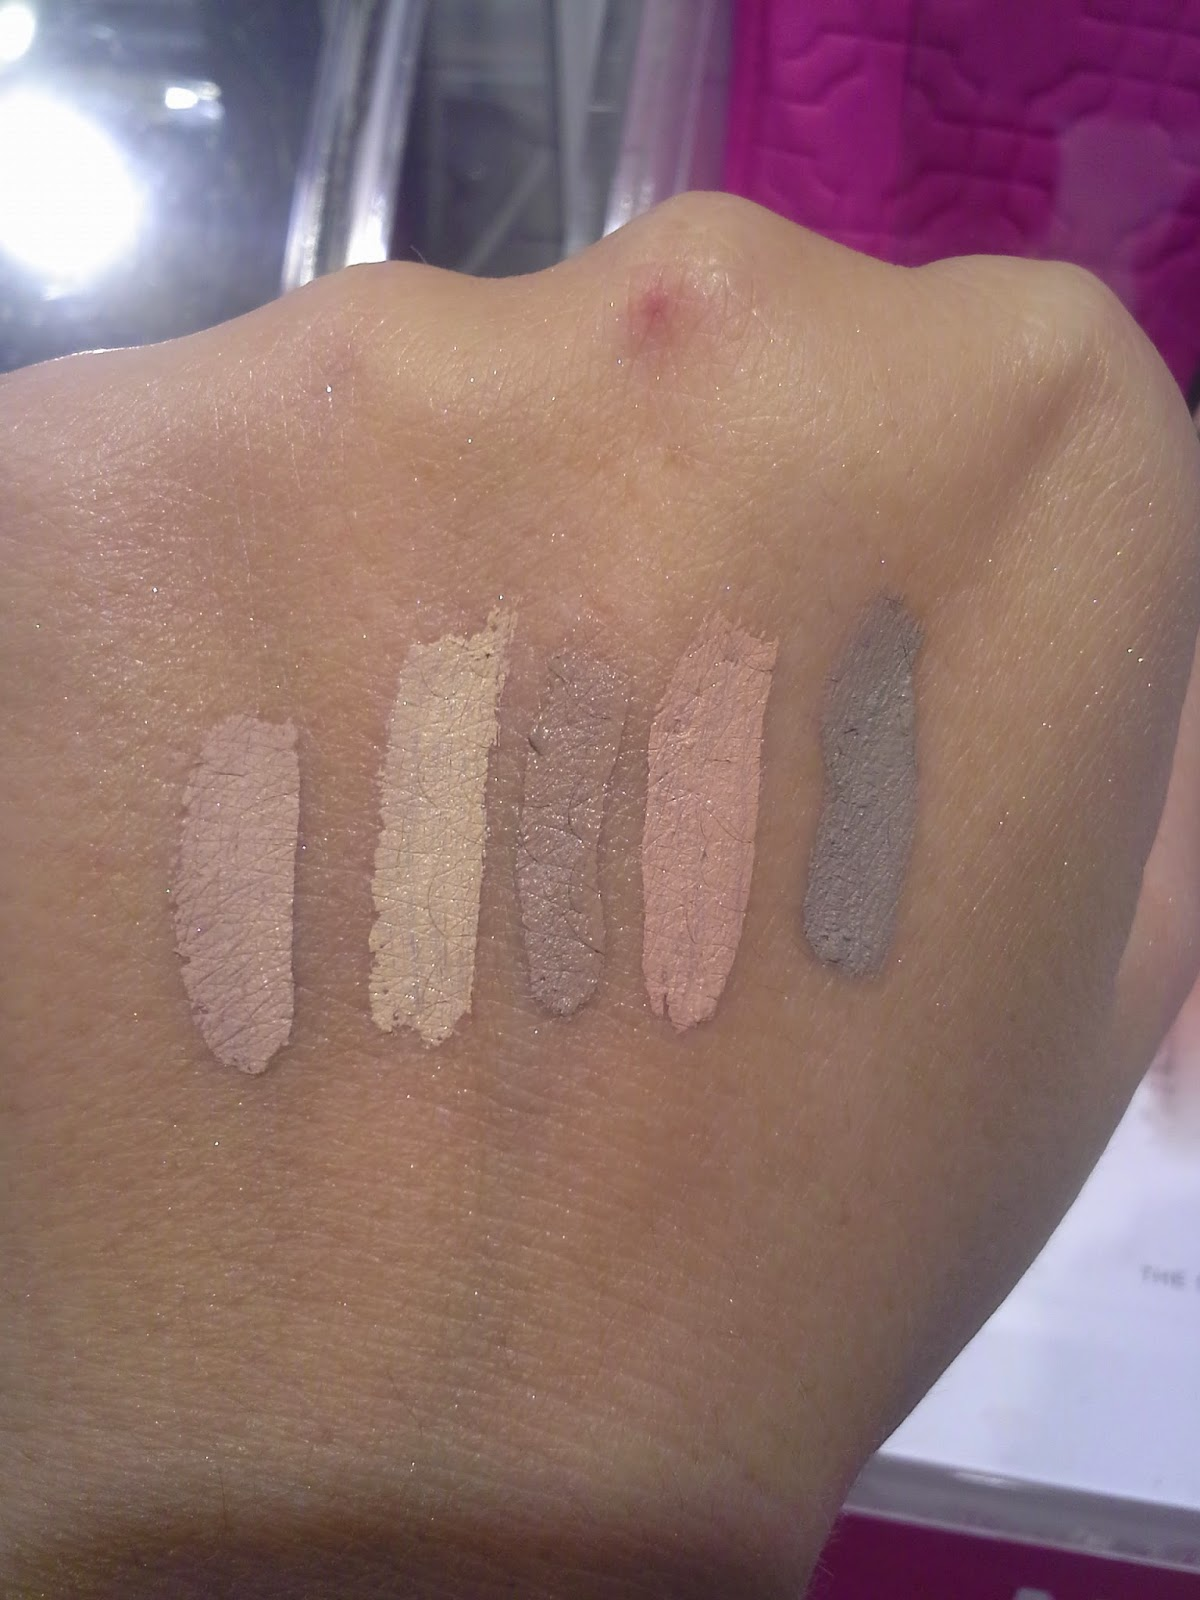 5-in-1 BB Advanced Performance Cream Eyeshadow by bareMinerals #12